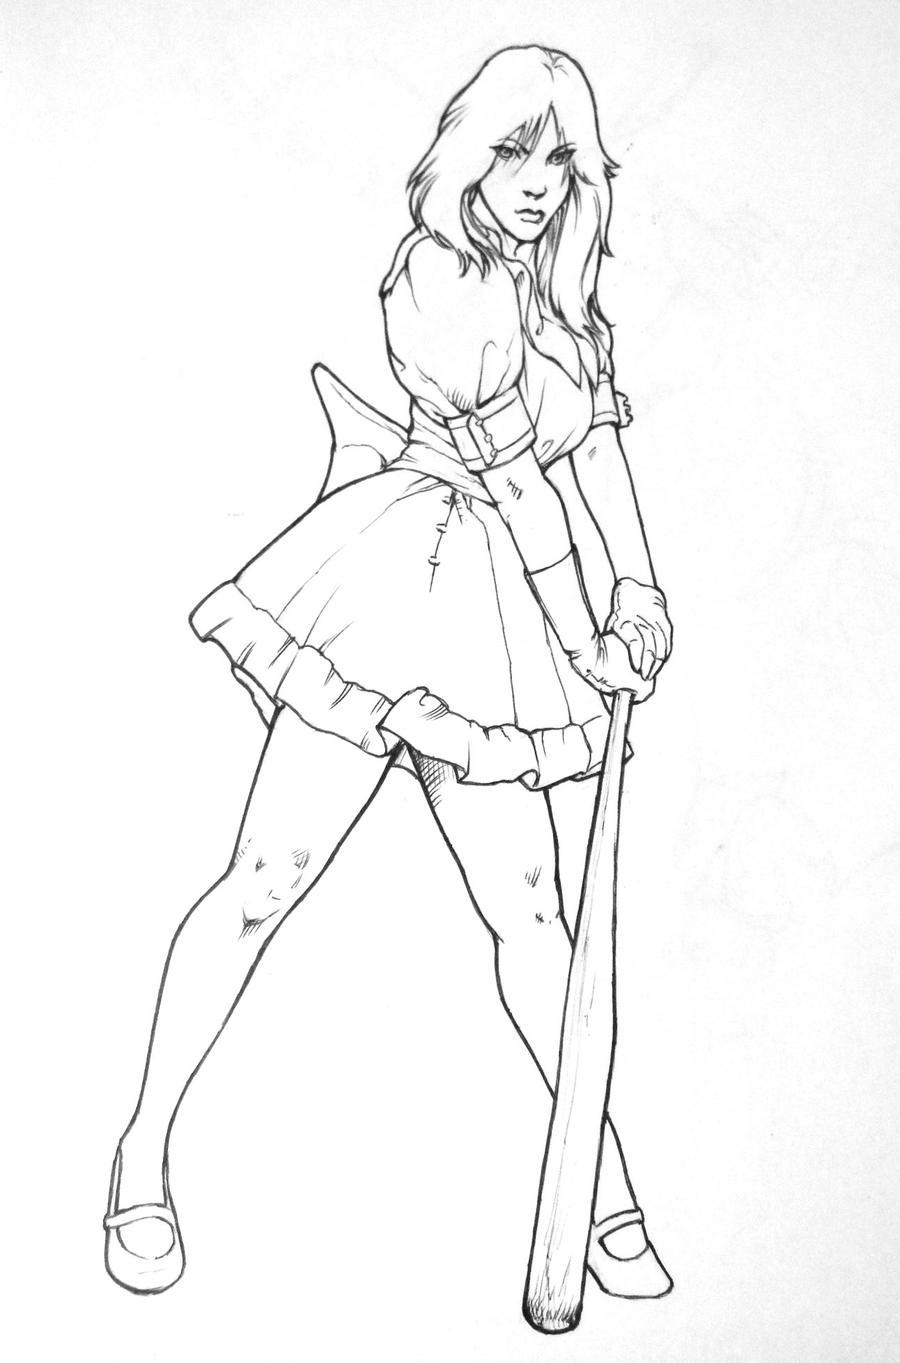 Bad Girl By Saurin369 On DeviantArt